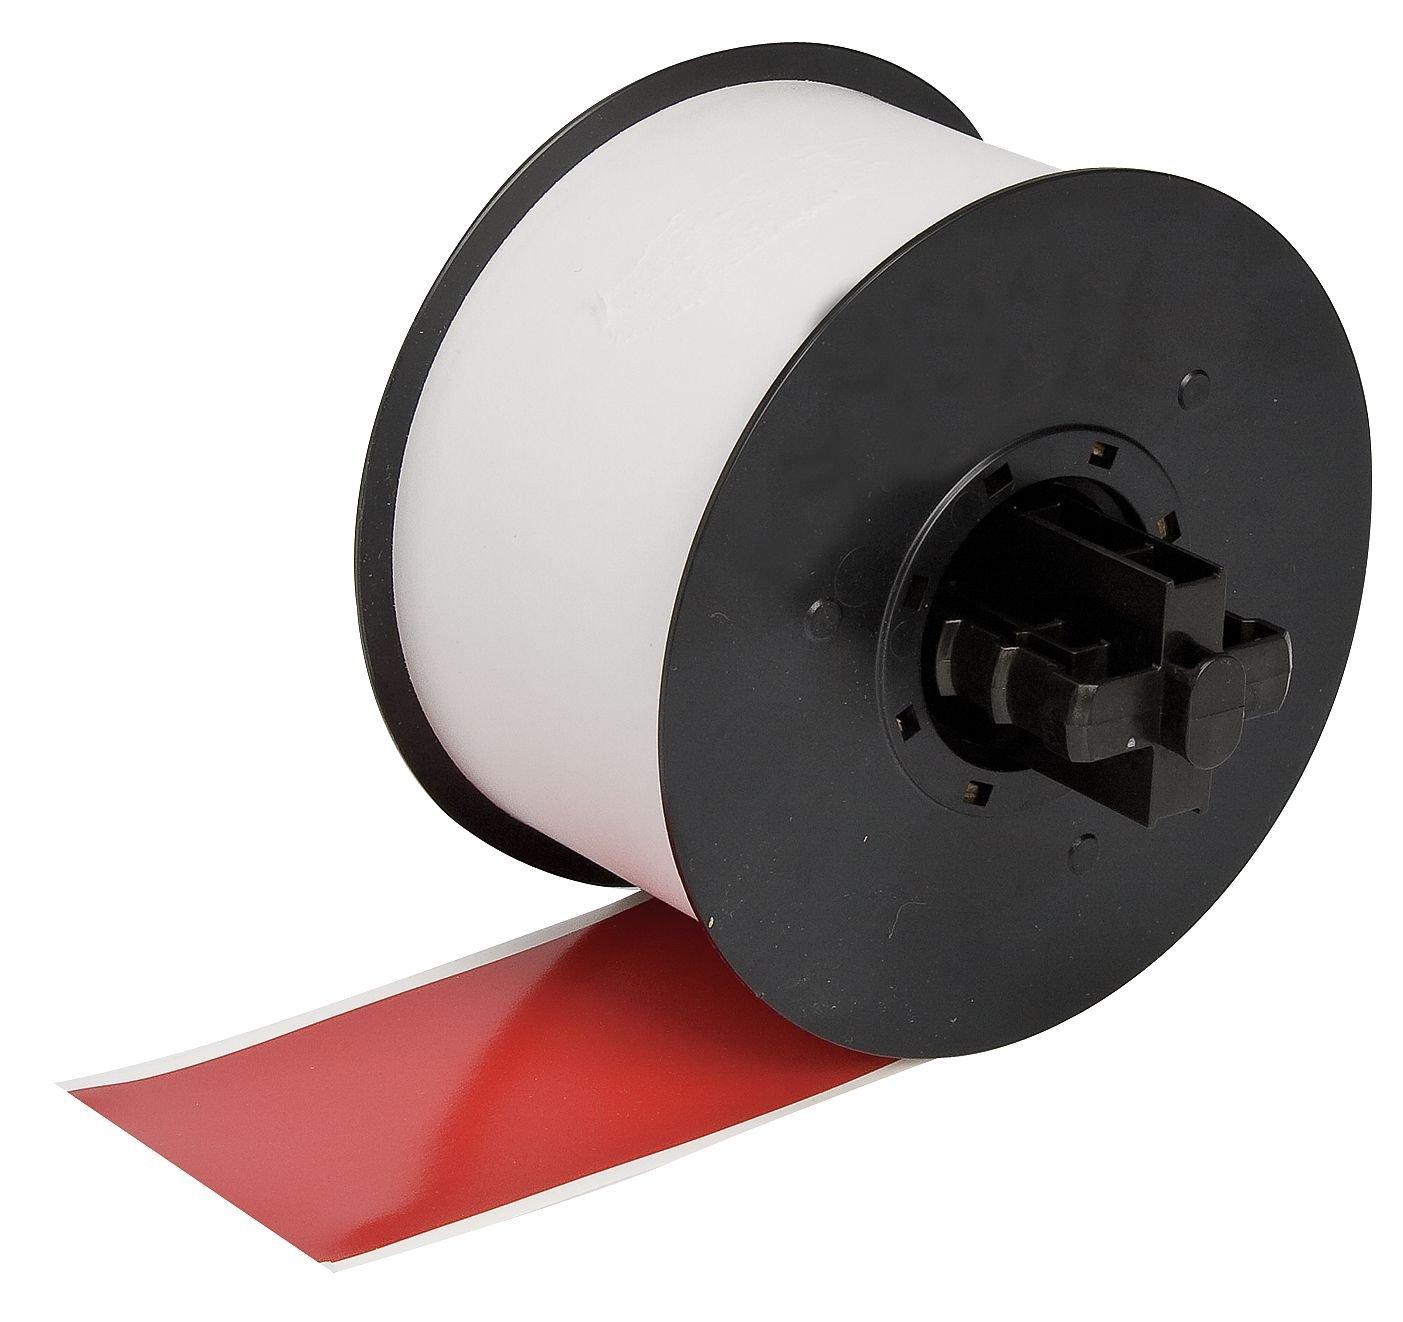 Red 0.500 x 100/' 0.500 x 100 Vinyl Film with Permanent Adhesive Brady 113199 Label